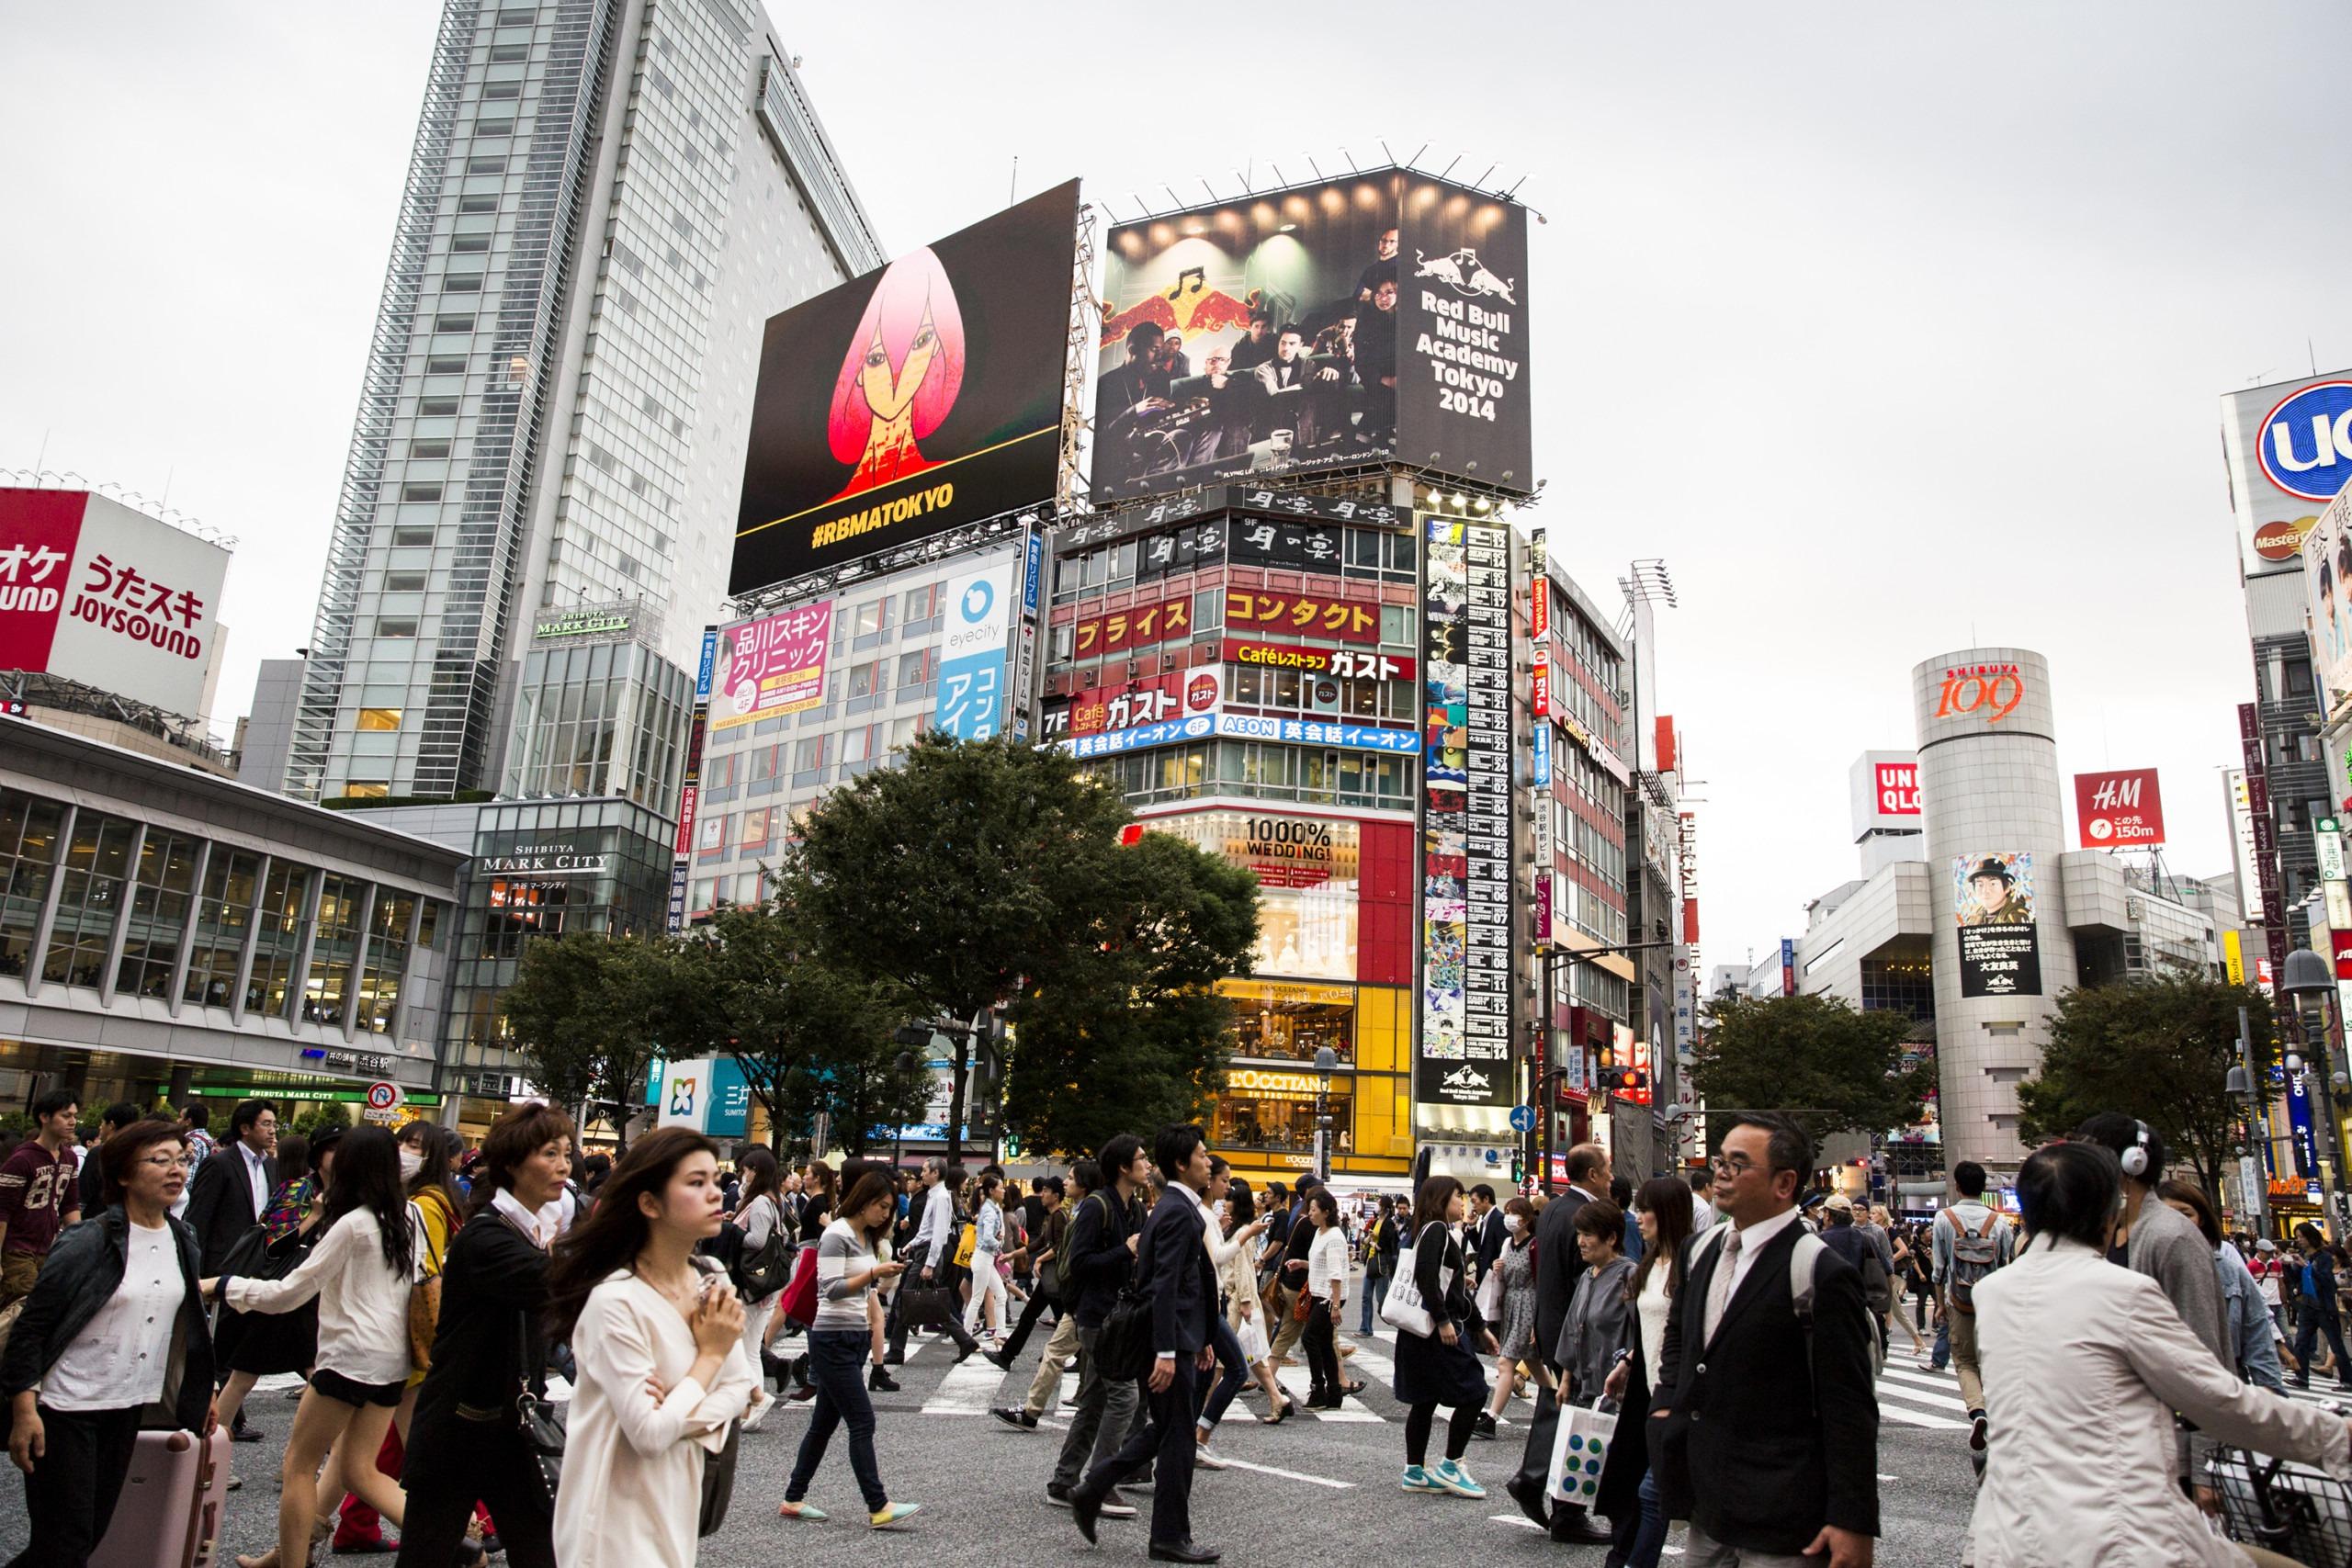 20141009_DW_RBMA_TOKYO_9404-2560×1707-1